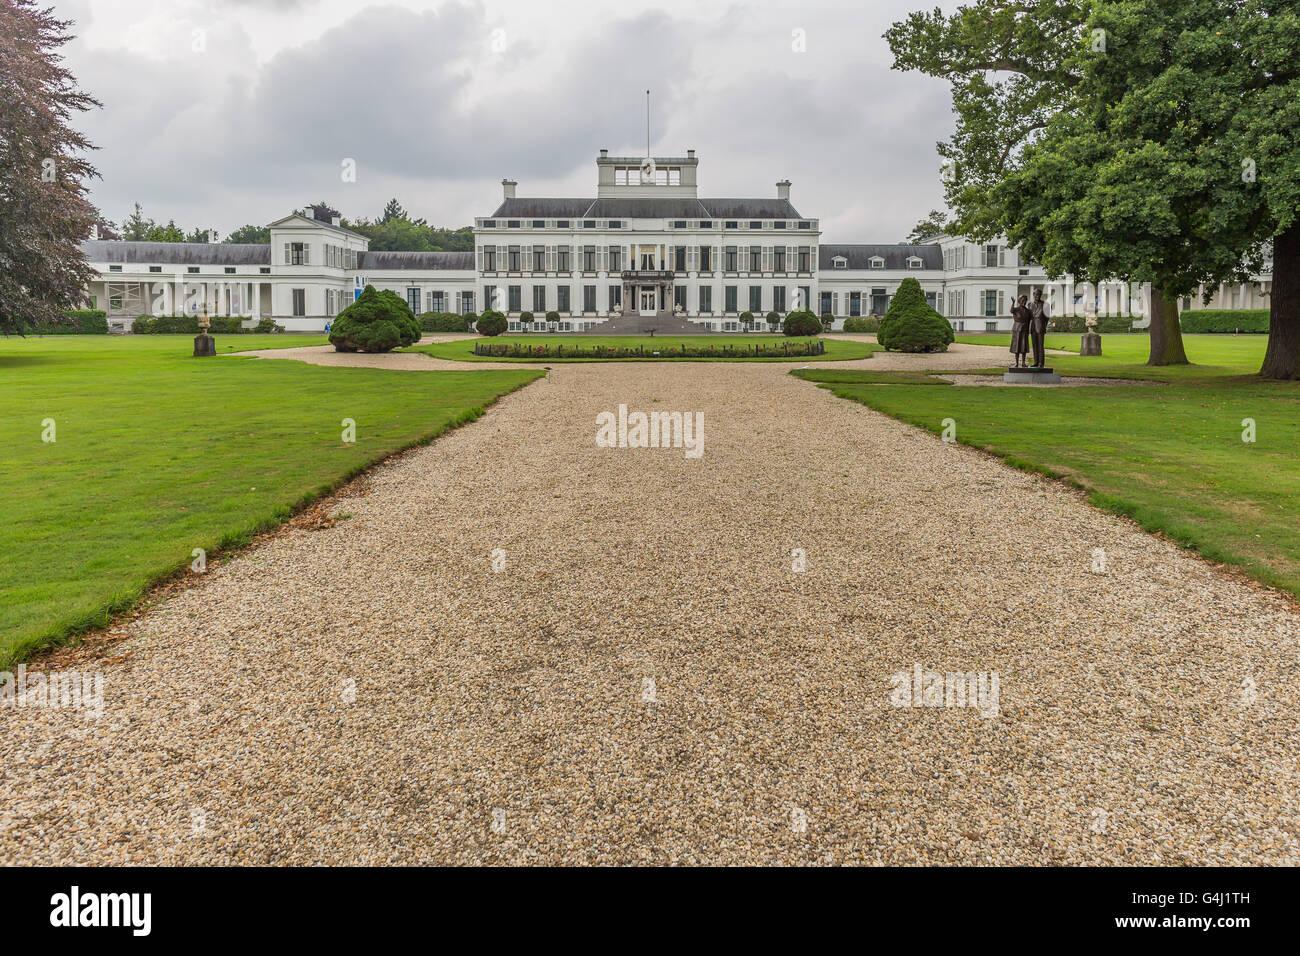 Dutch Royal Family Stock Photos & Dutch Royal Family Stock Images ...